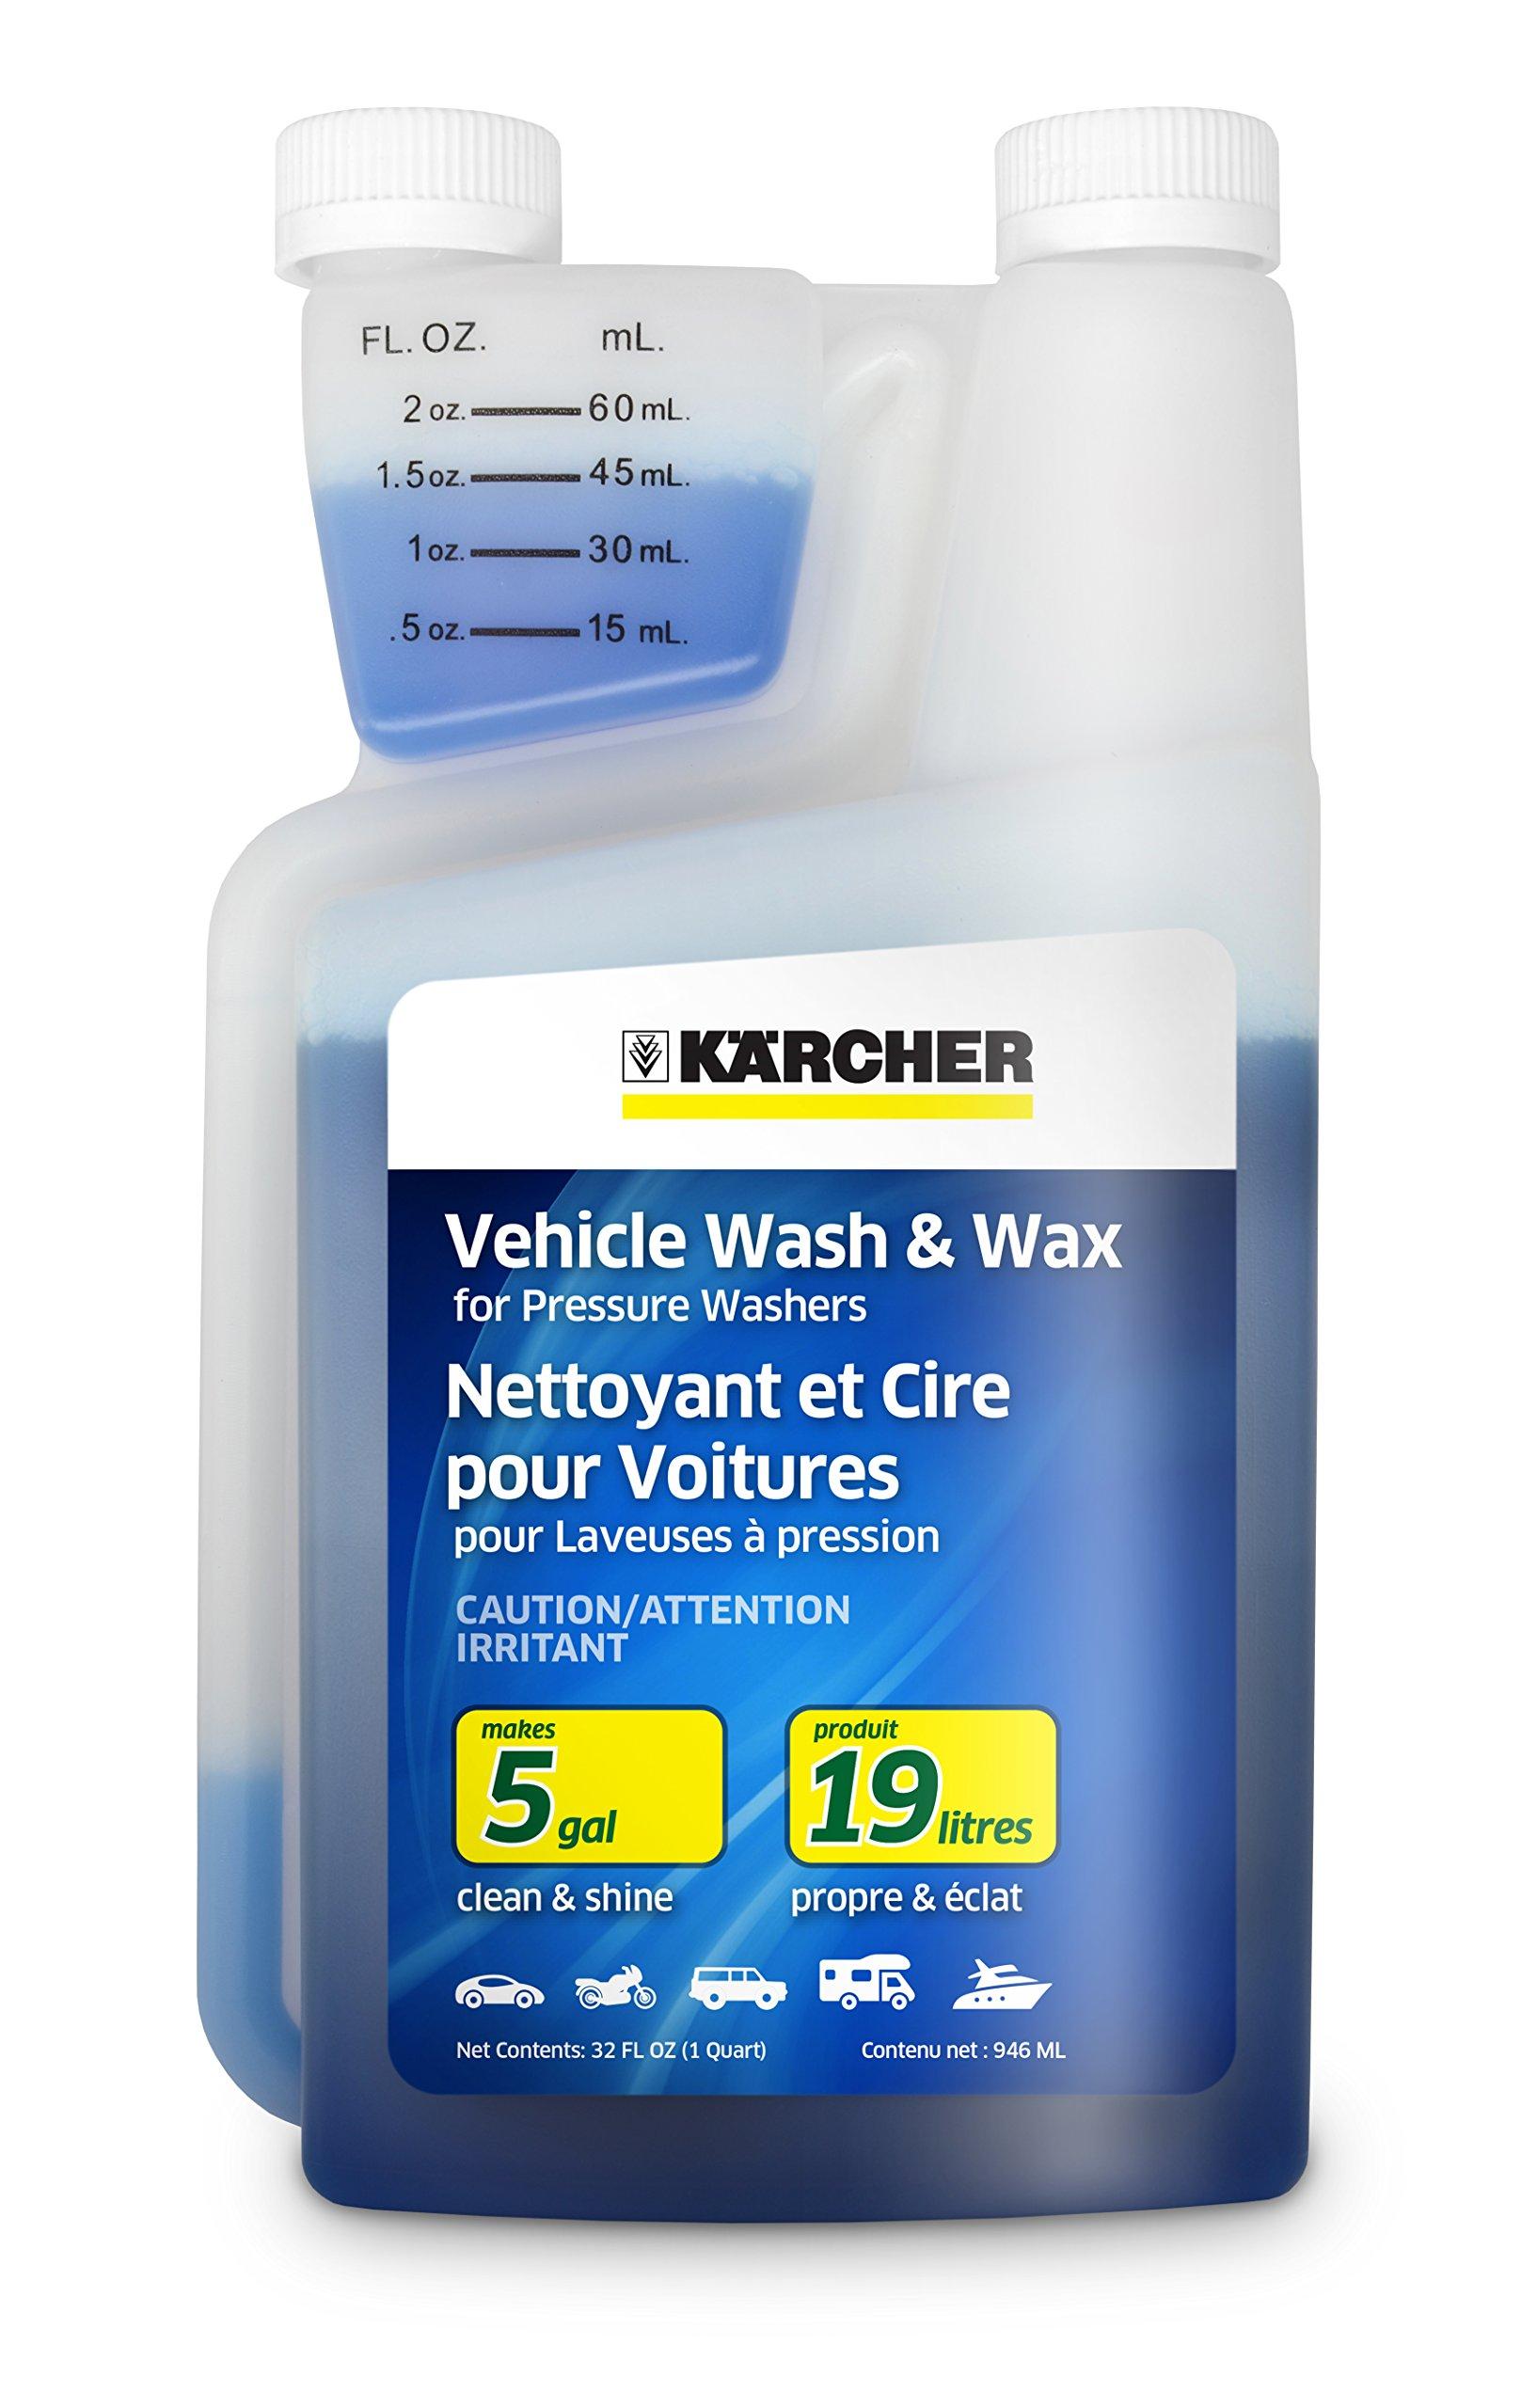 karcher-car-wash-wax-soap-for-pressure-washers-1-quart-best-pressure-washer-detergent-soap-reviews